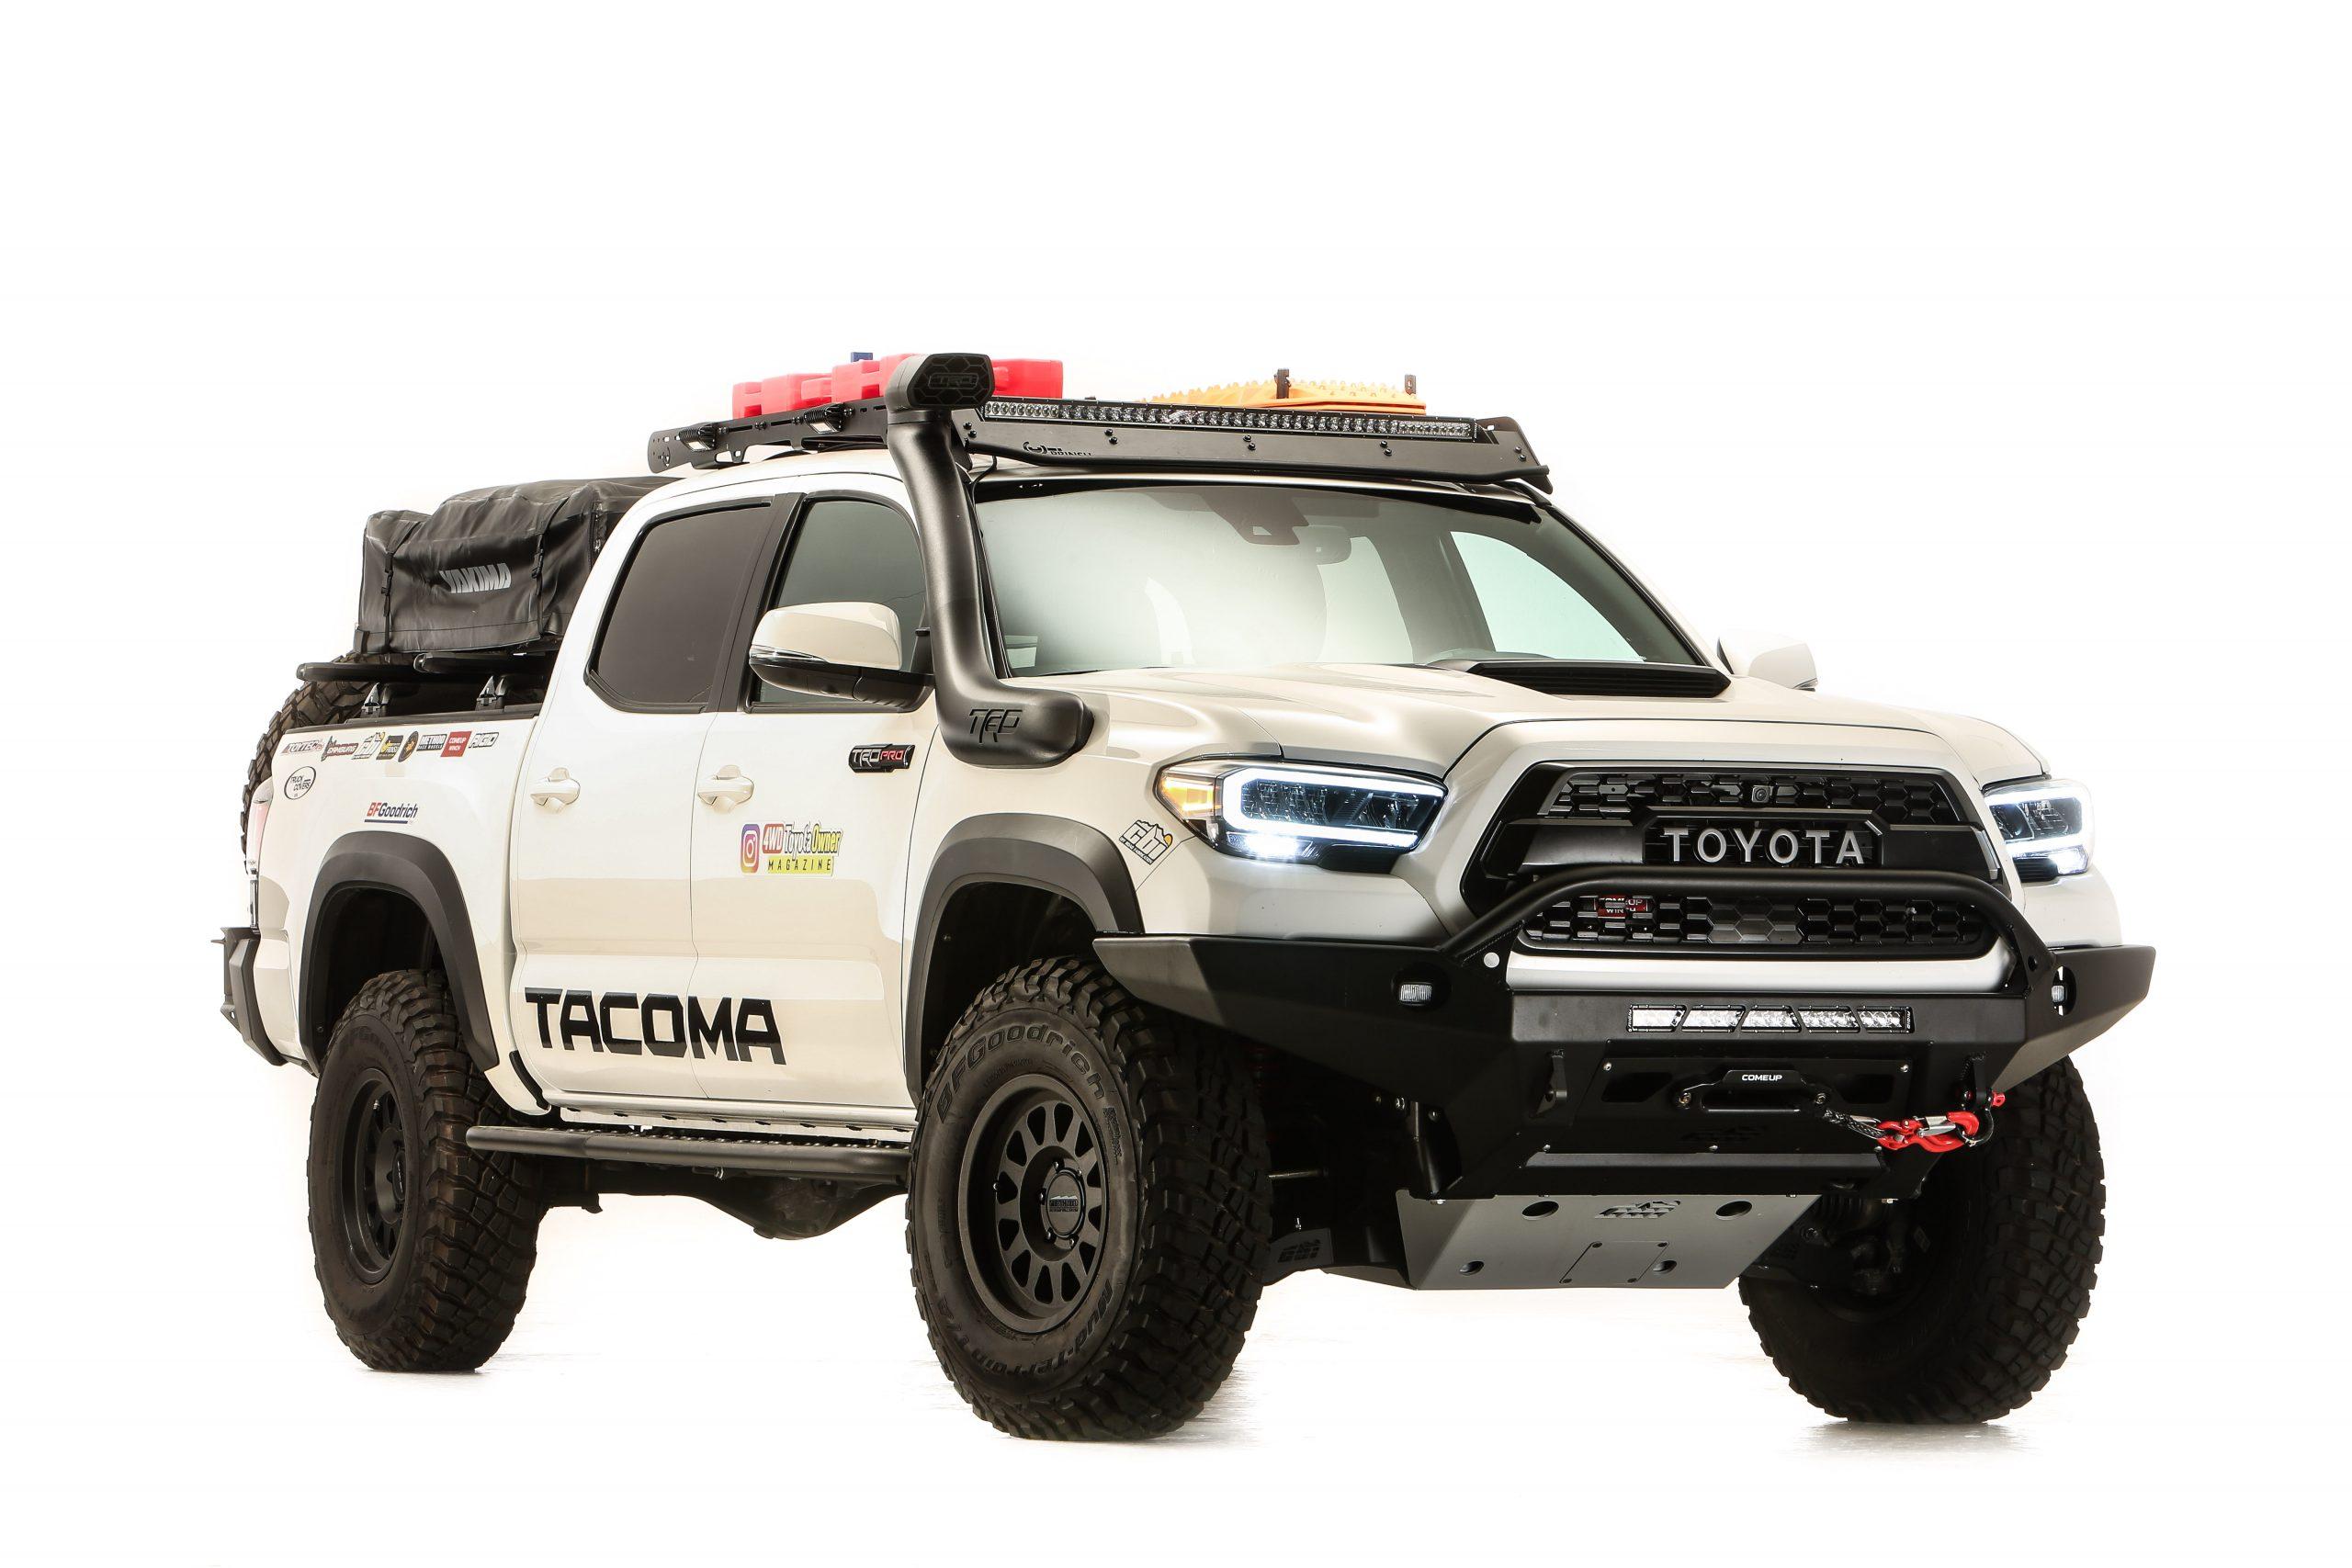 2020 Toyota Tacoma SEMA 360 overland front